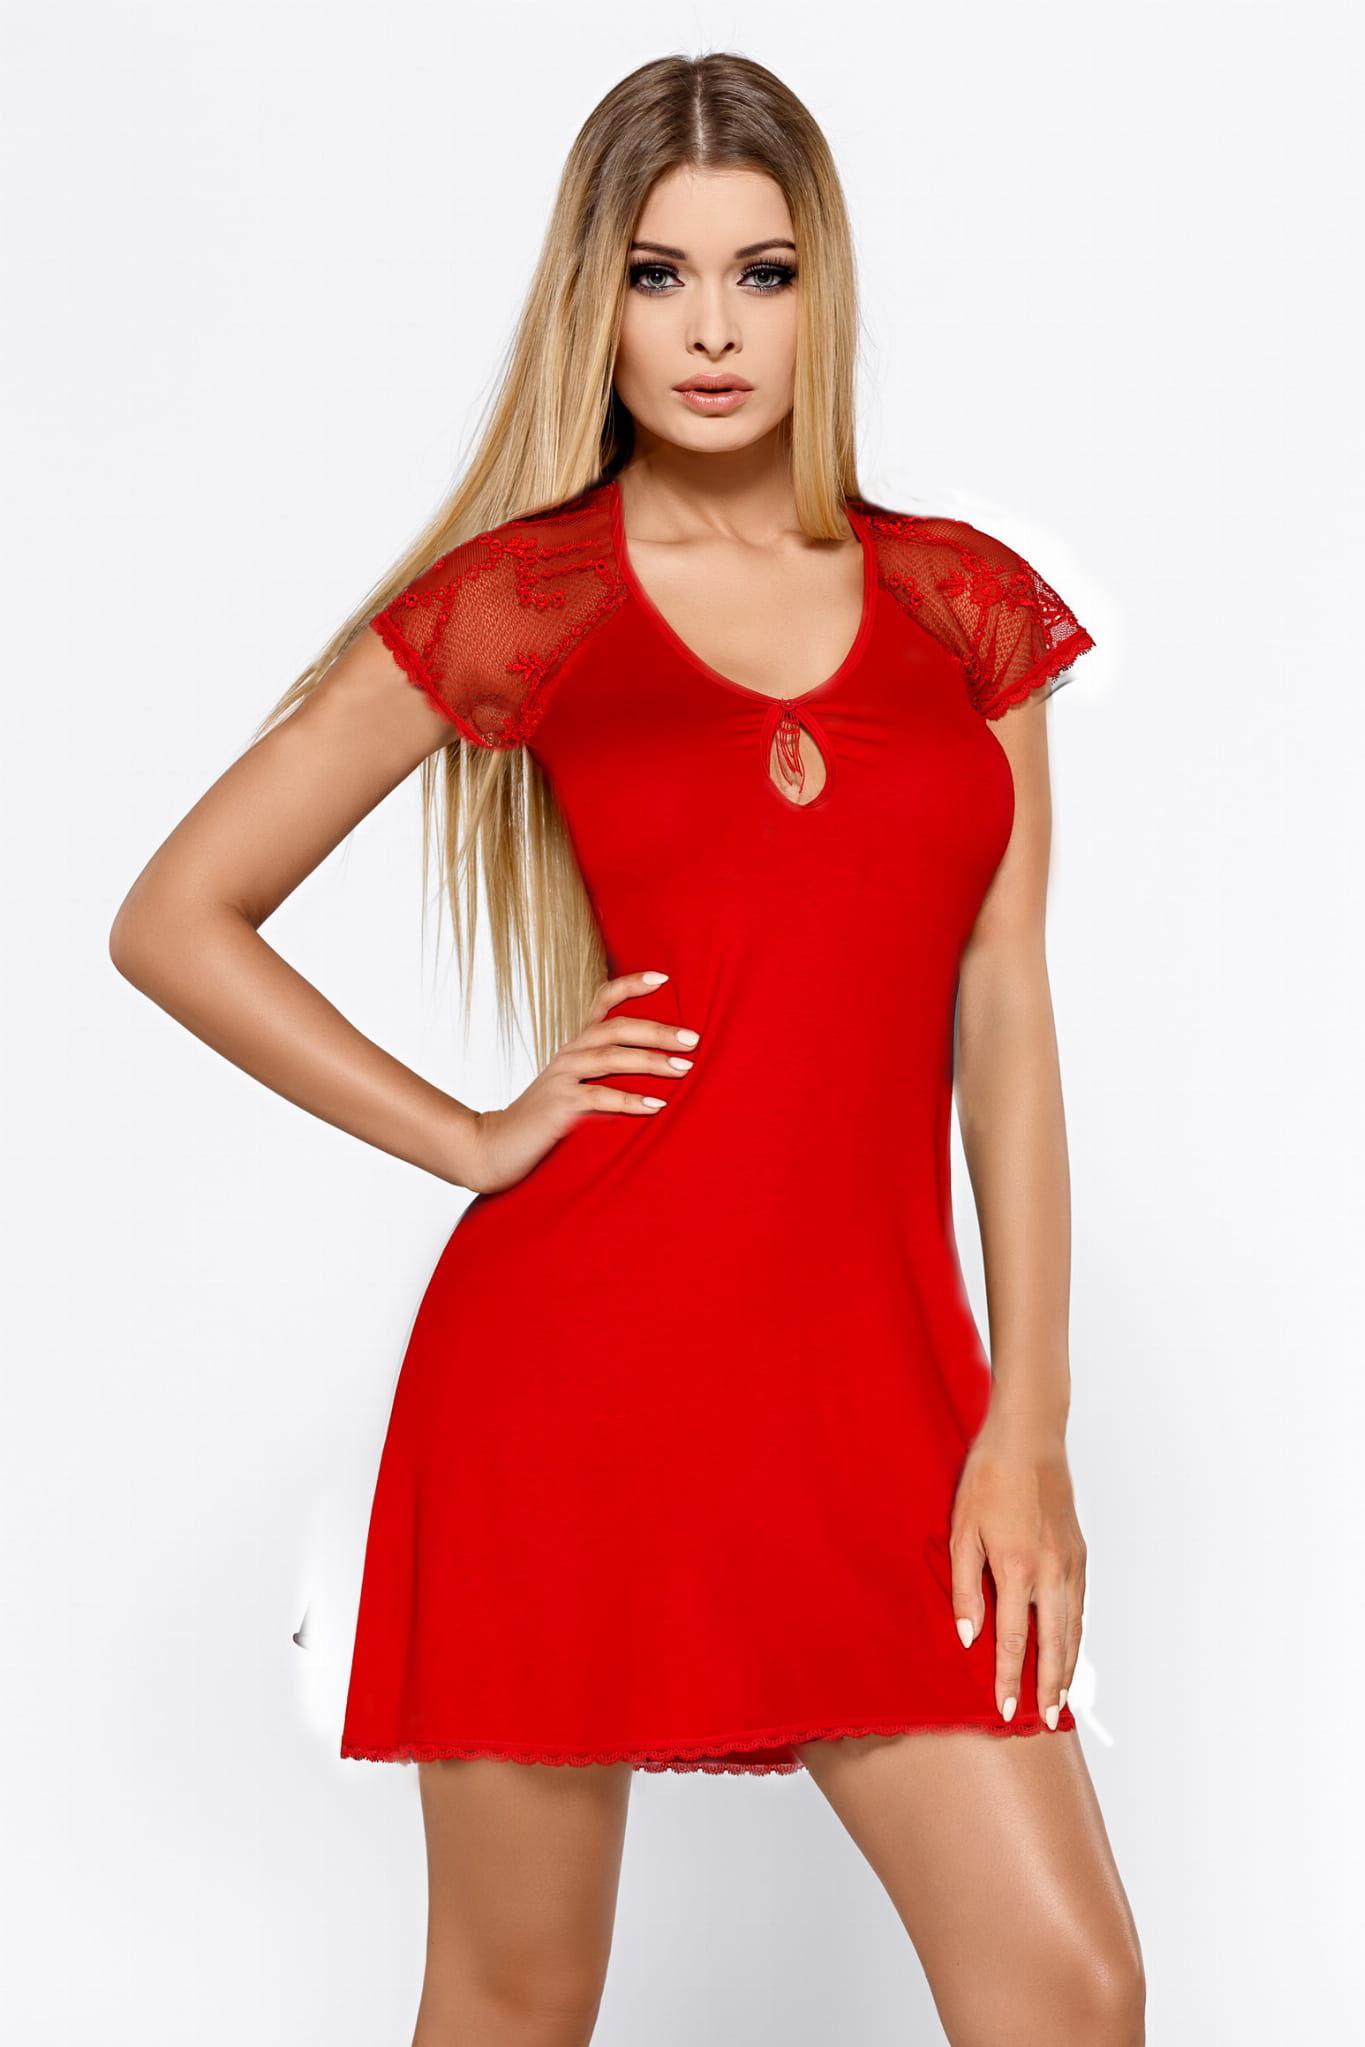 Koszulka nocna damska Hamana Hillary czerwona